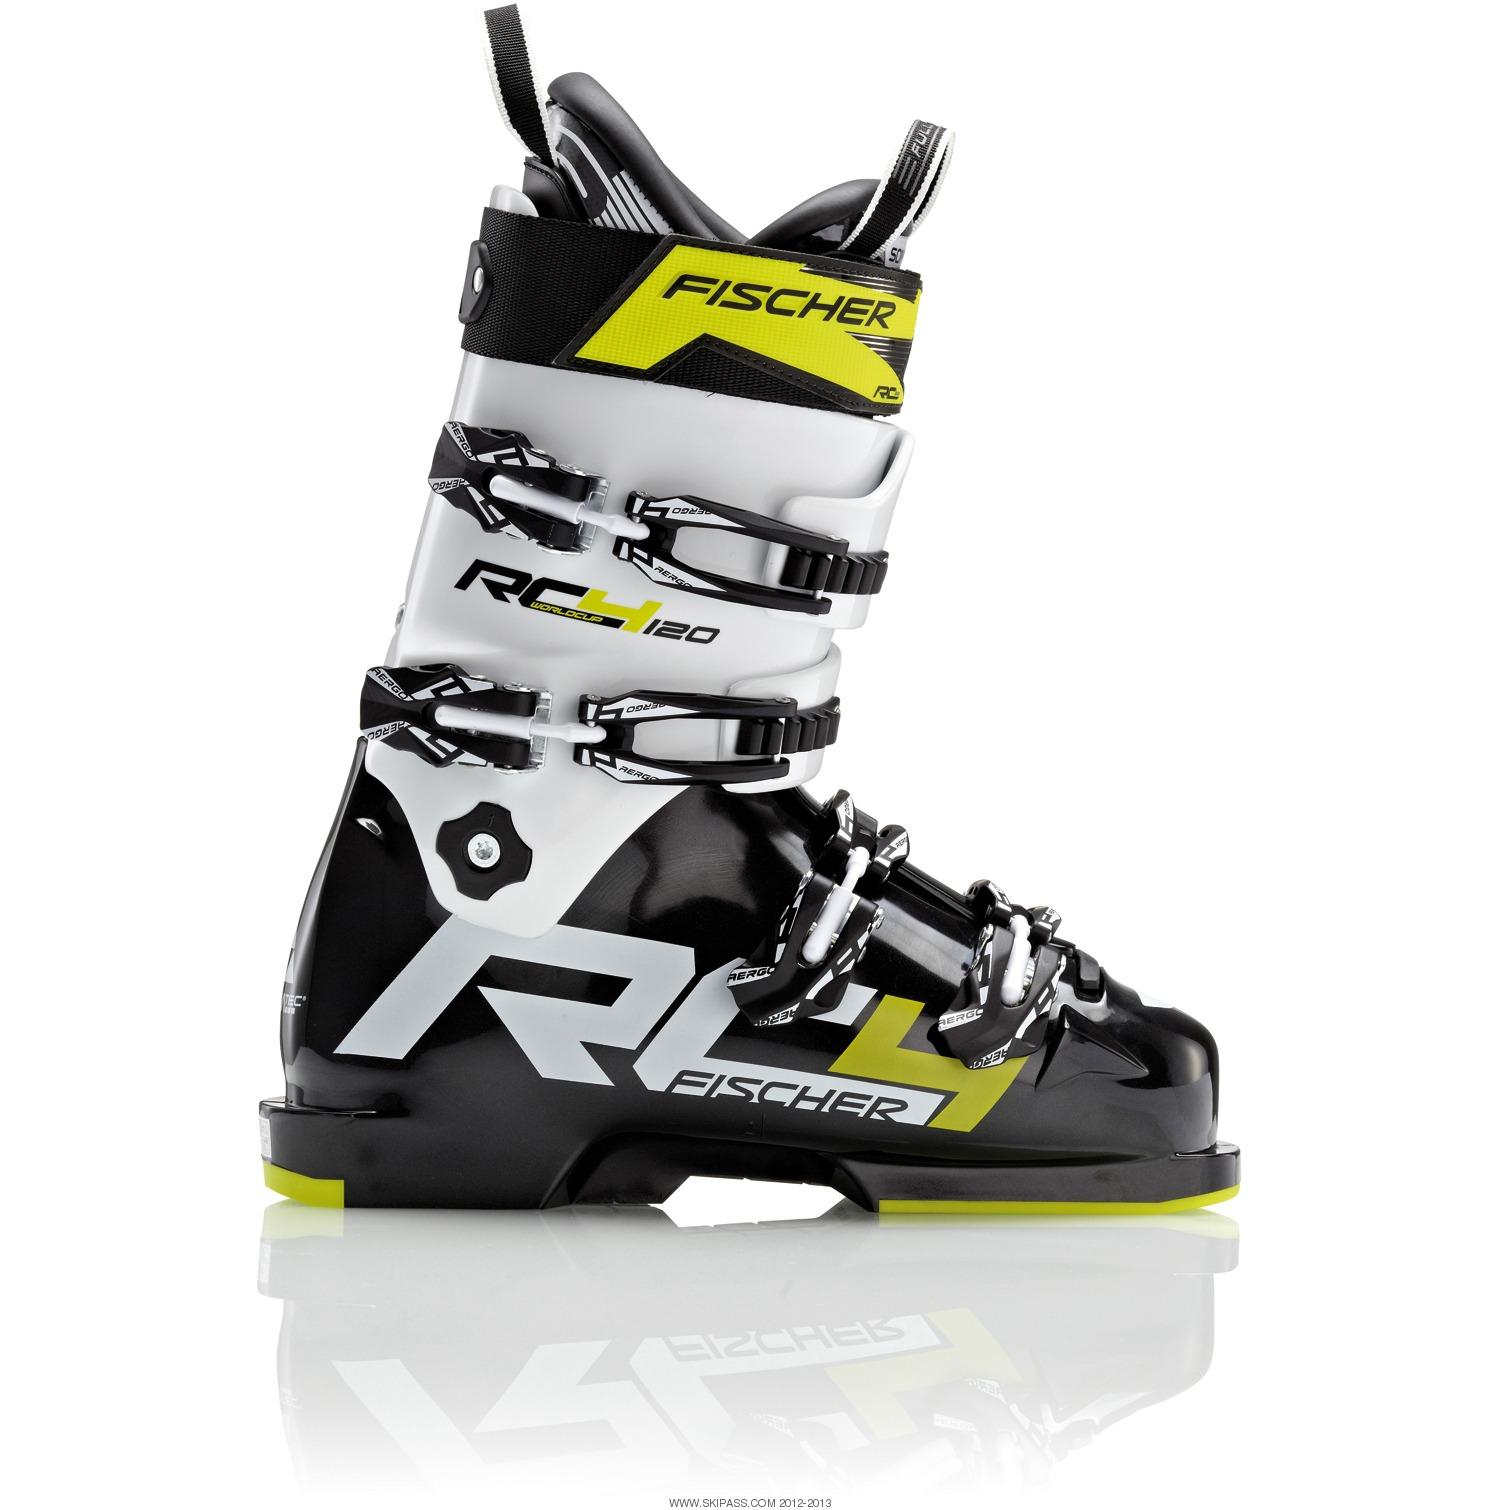 Rc4 De Rc4 Fischer chaussures 130 Ski Chaussure Vacuum XwPuikZOT